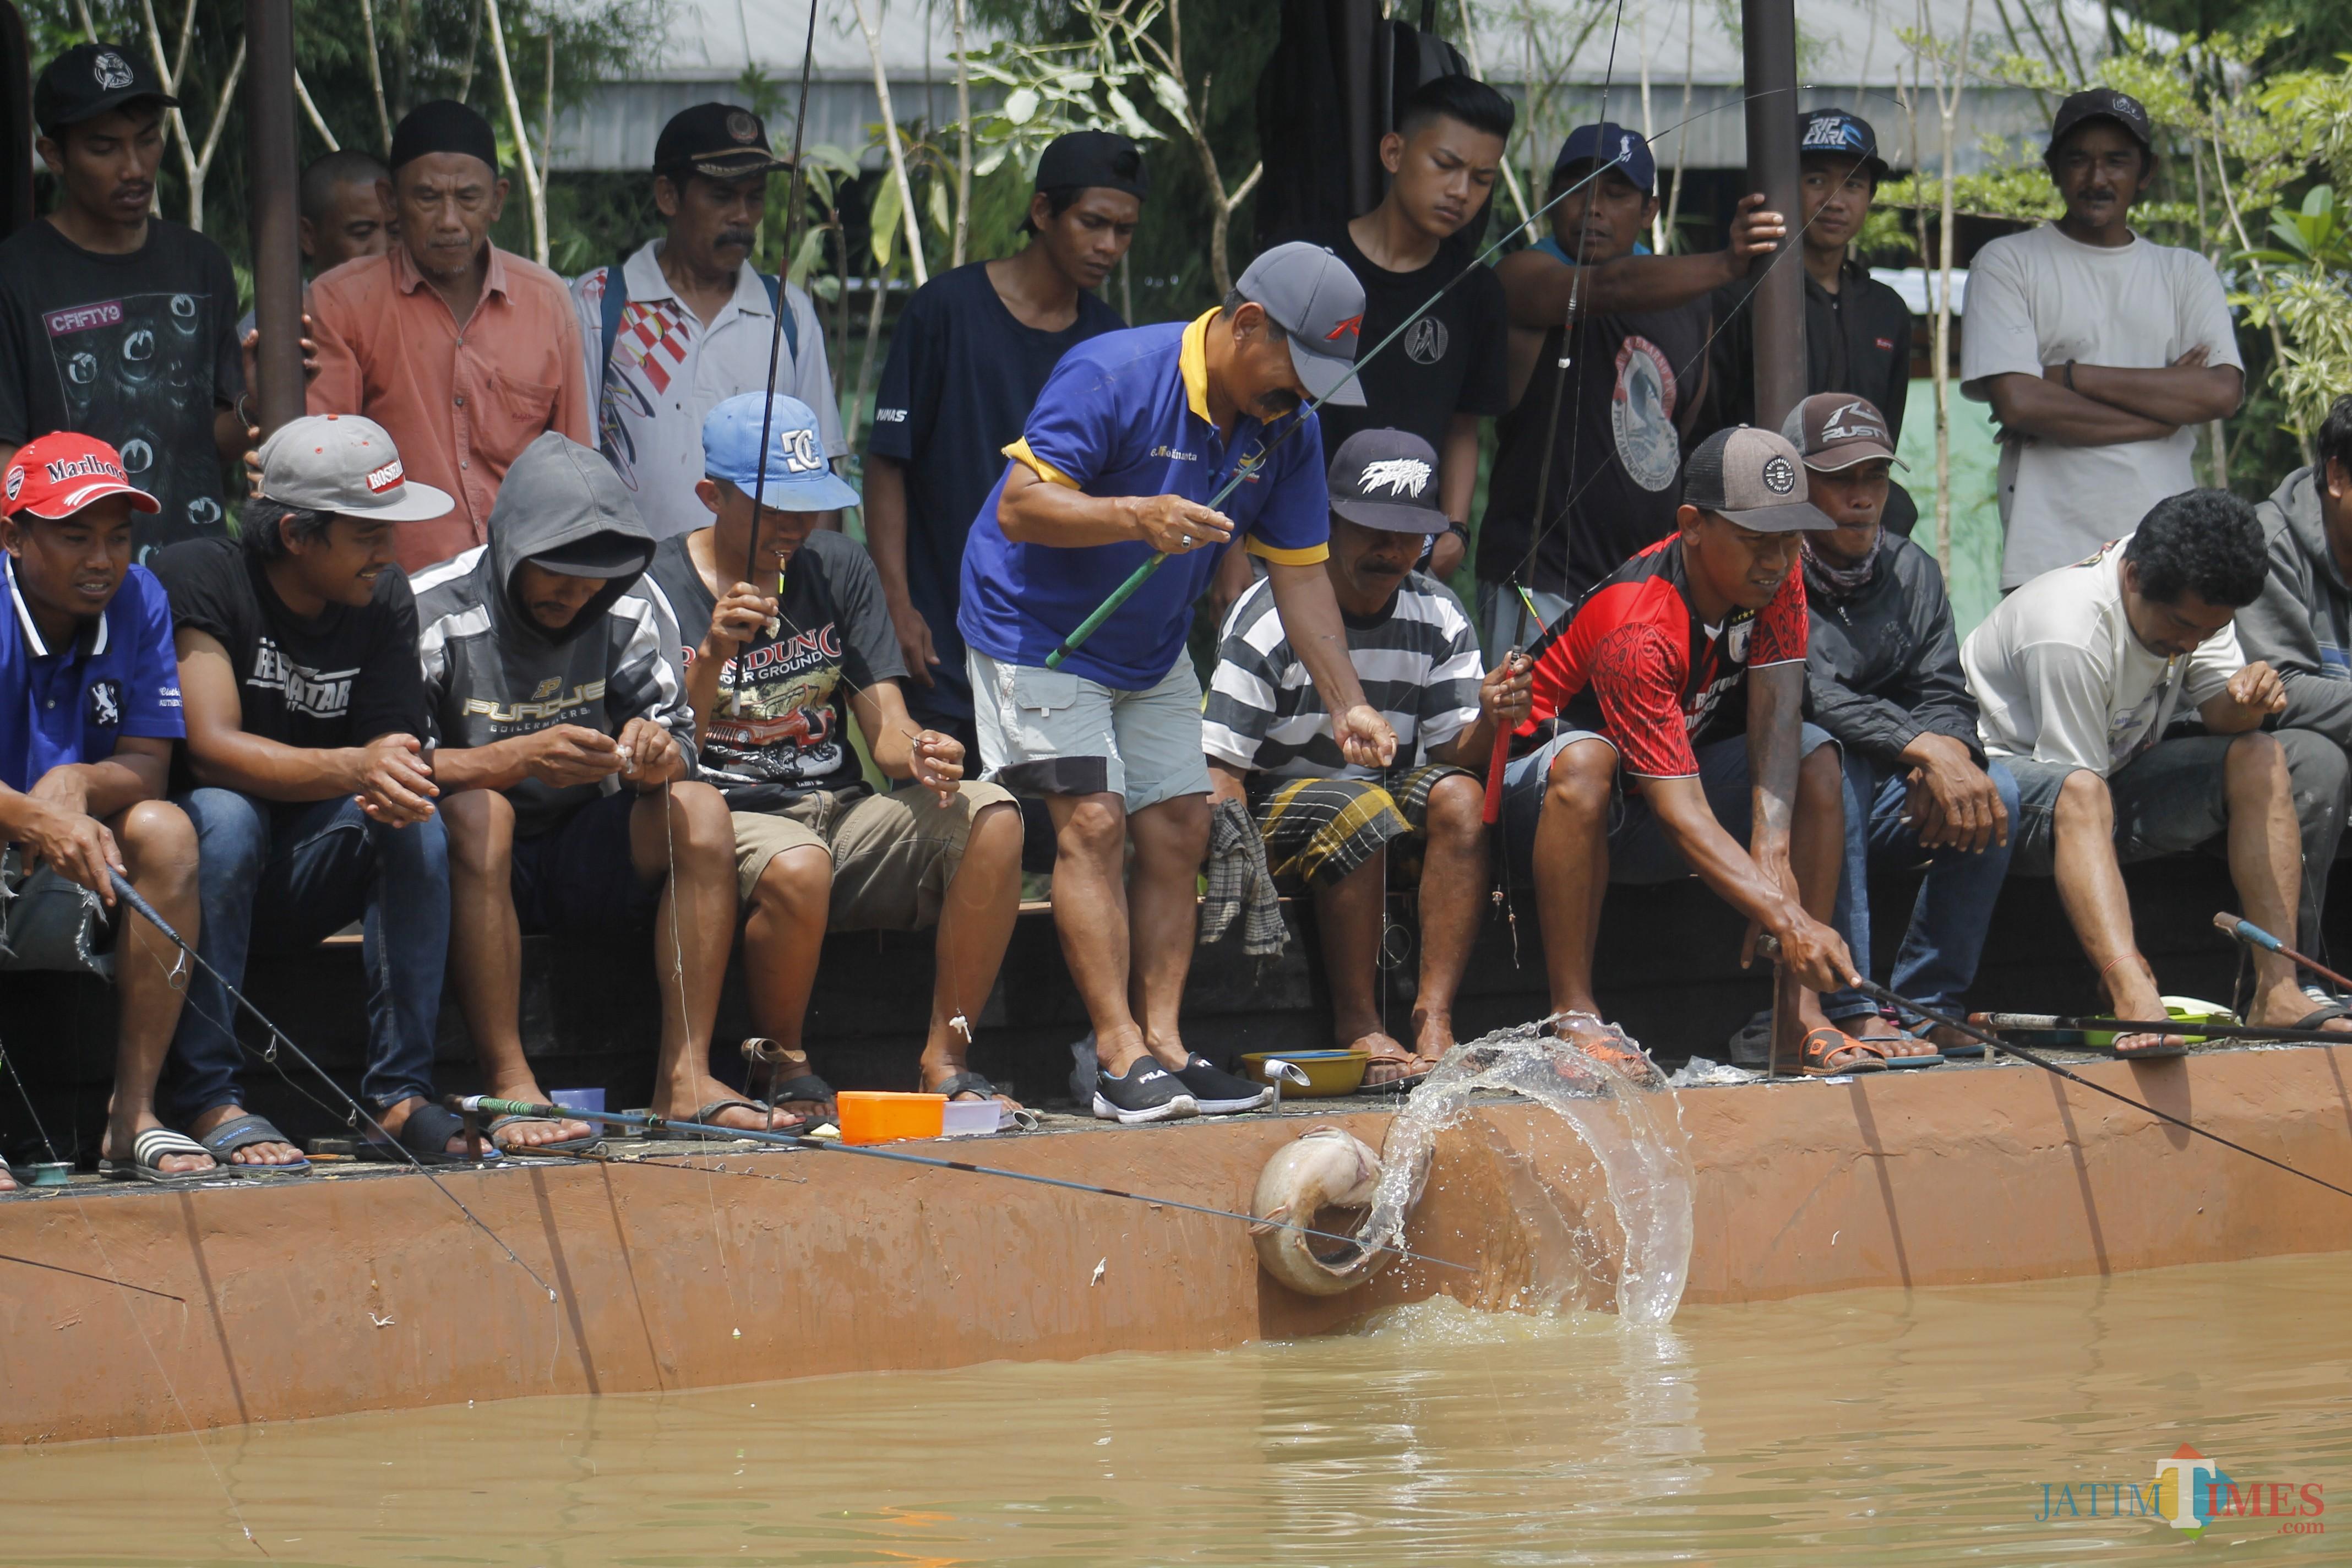 peserta megnangkat lele hasil pancingan yang berukuran sebesar betis orang dewasa ( Luqmanul Hakim/Malang Times)